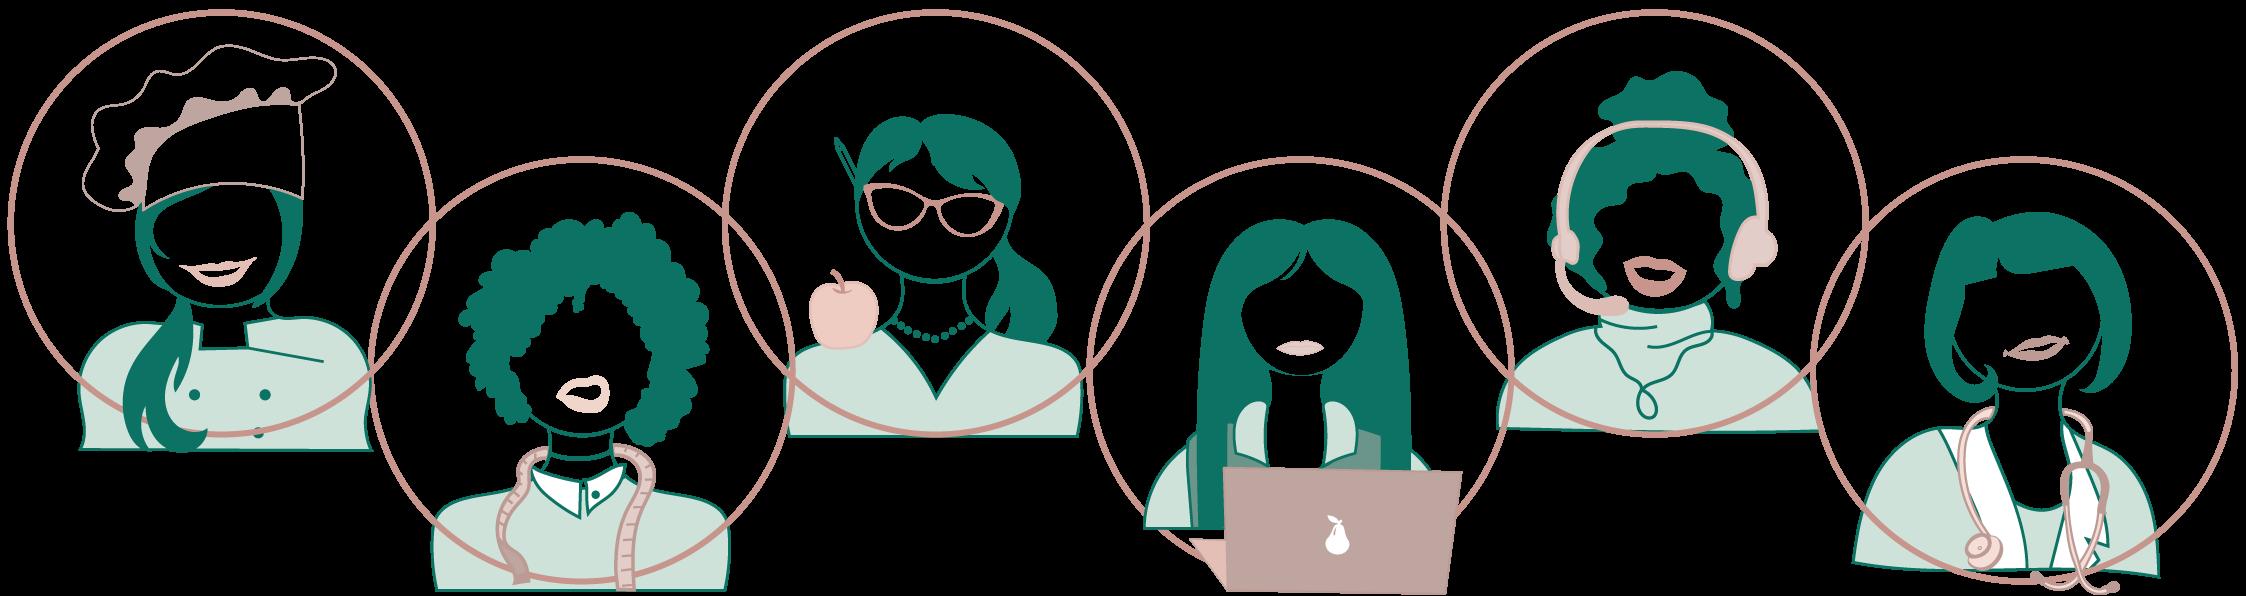 WorkingWomen_6.3.png